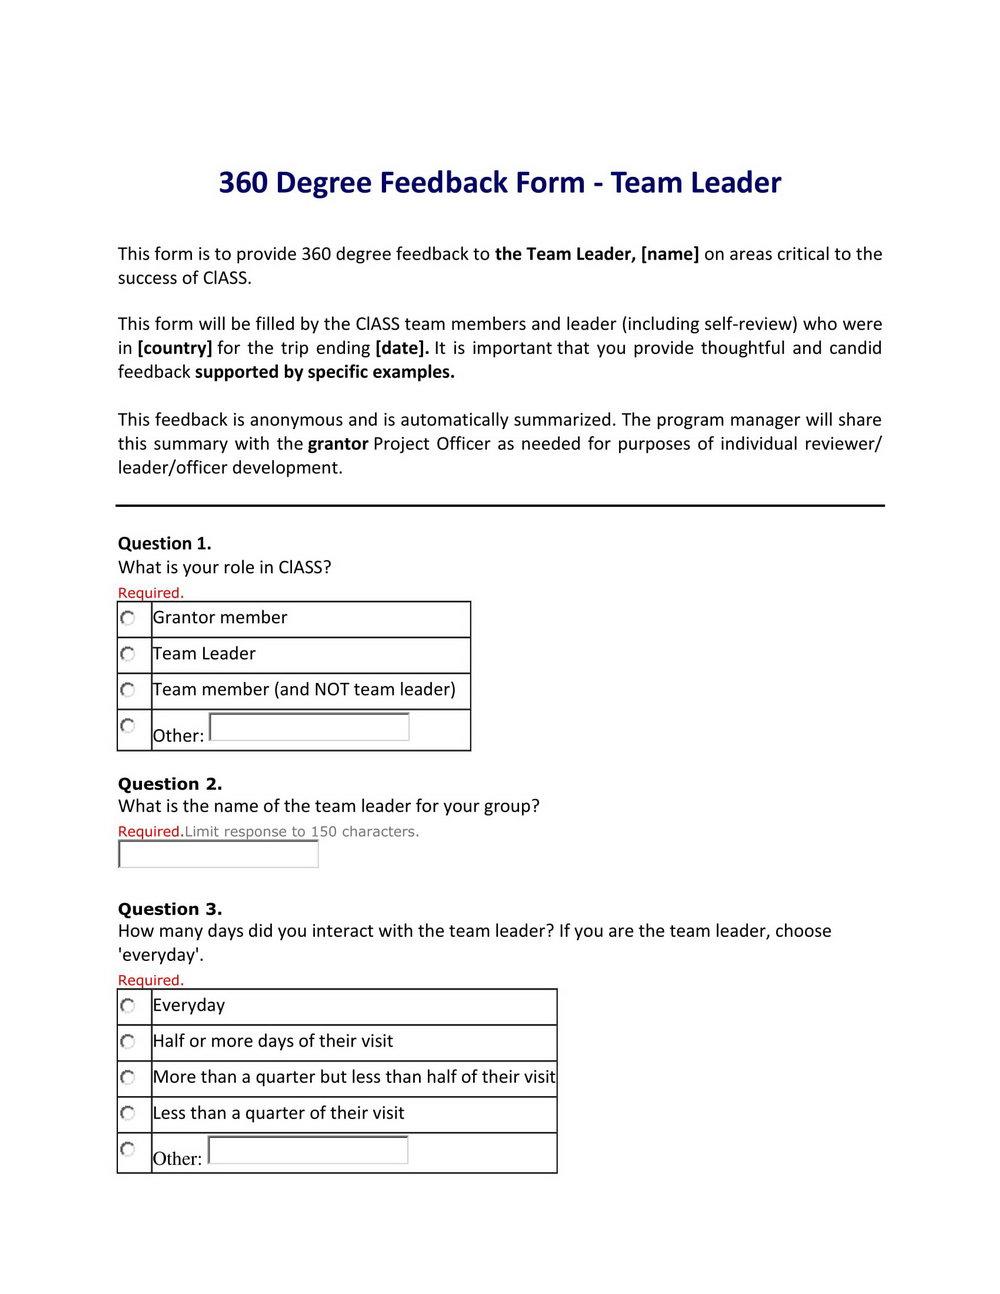 360 Degree Feedback Template Pdf